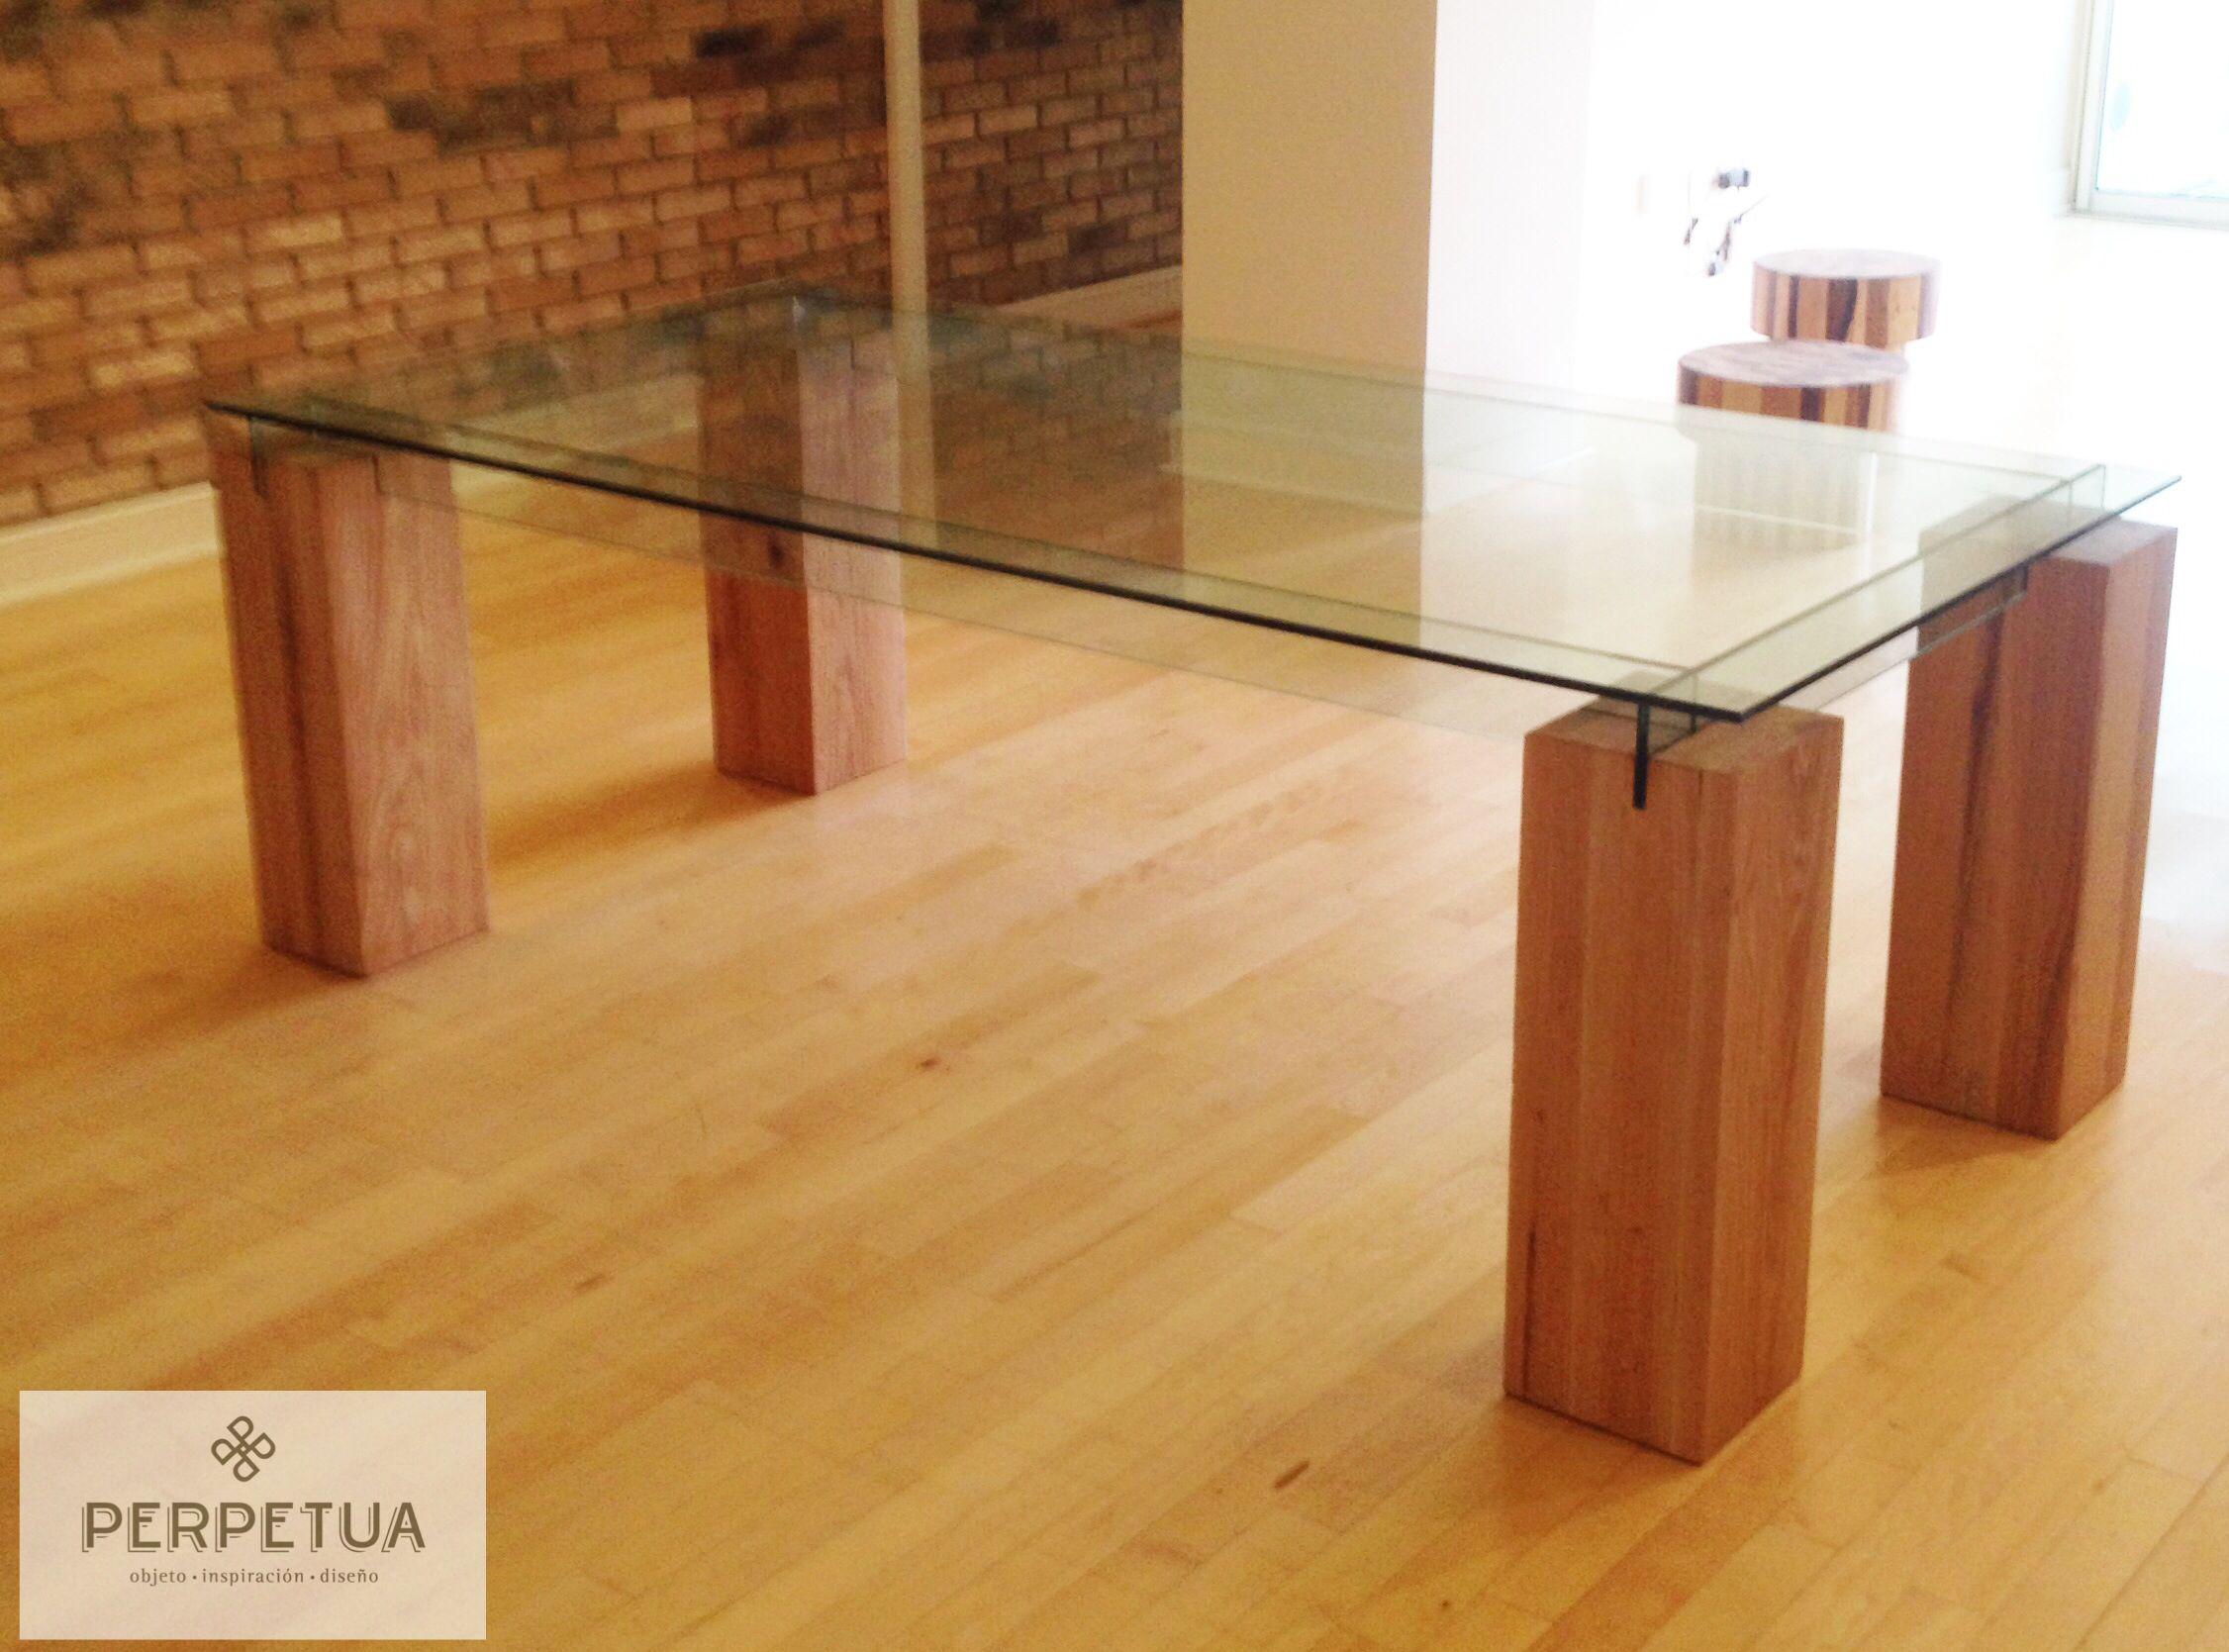 Perpetua muebles #perpetua #muebles #madera #mesa #comedor #vidrio ...